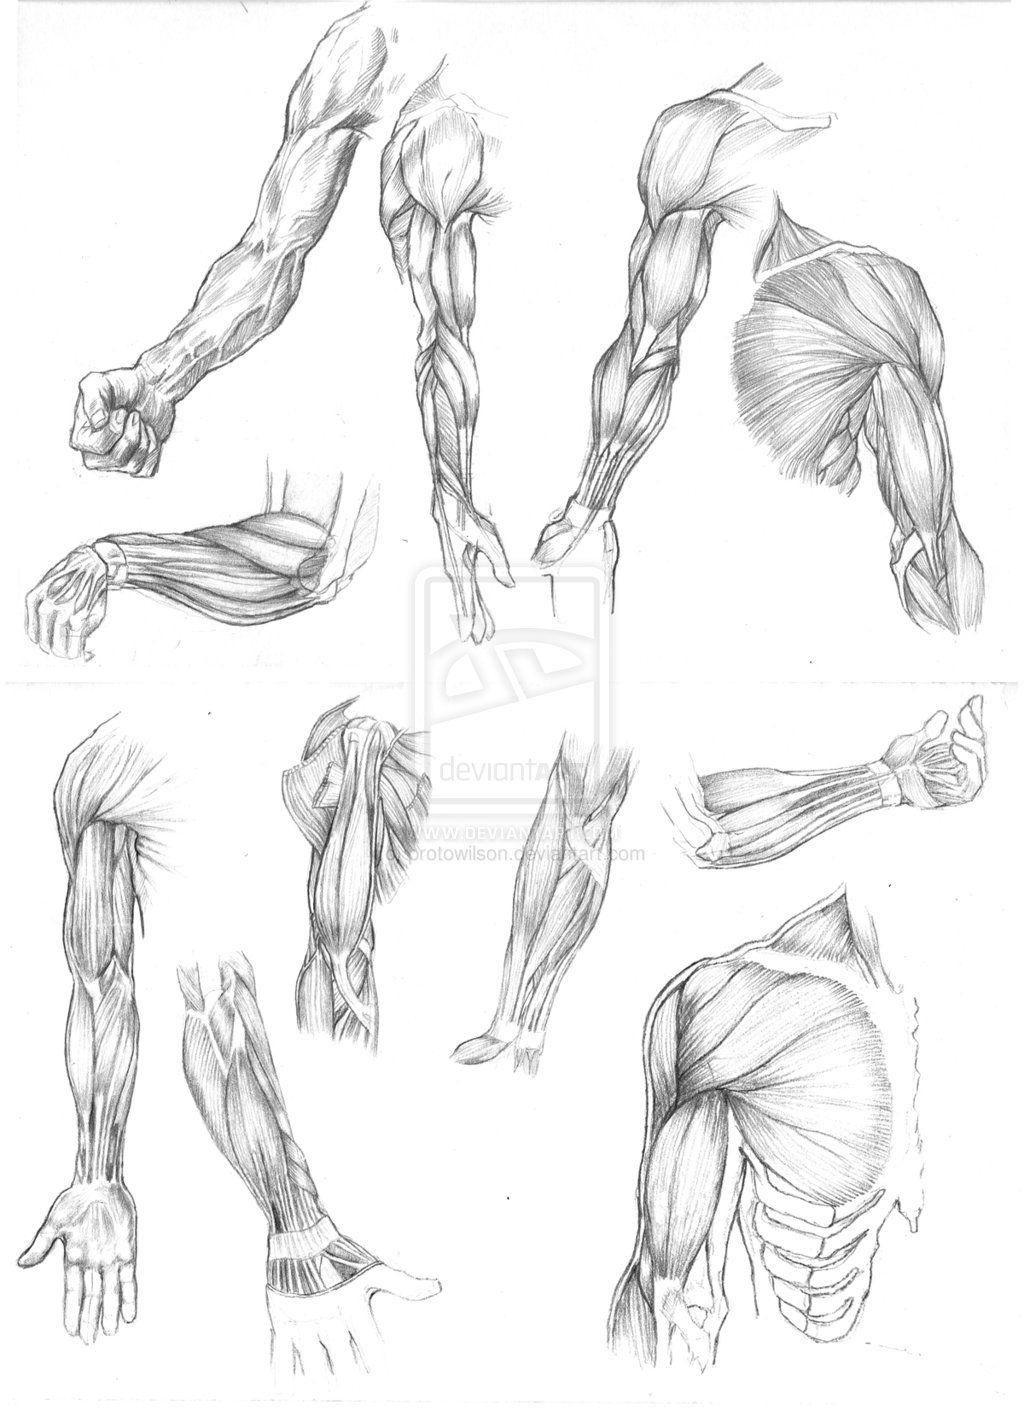 Muscle anatomy drawing